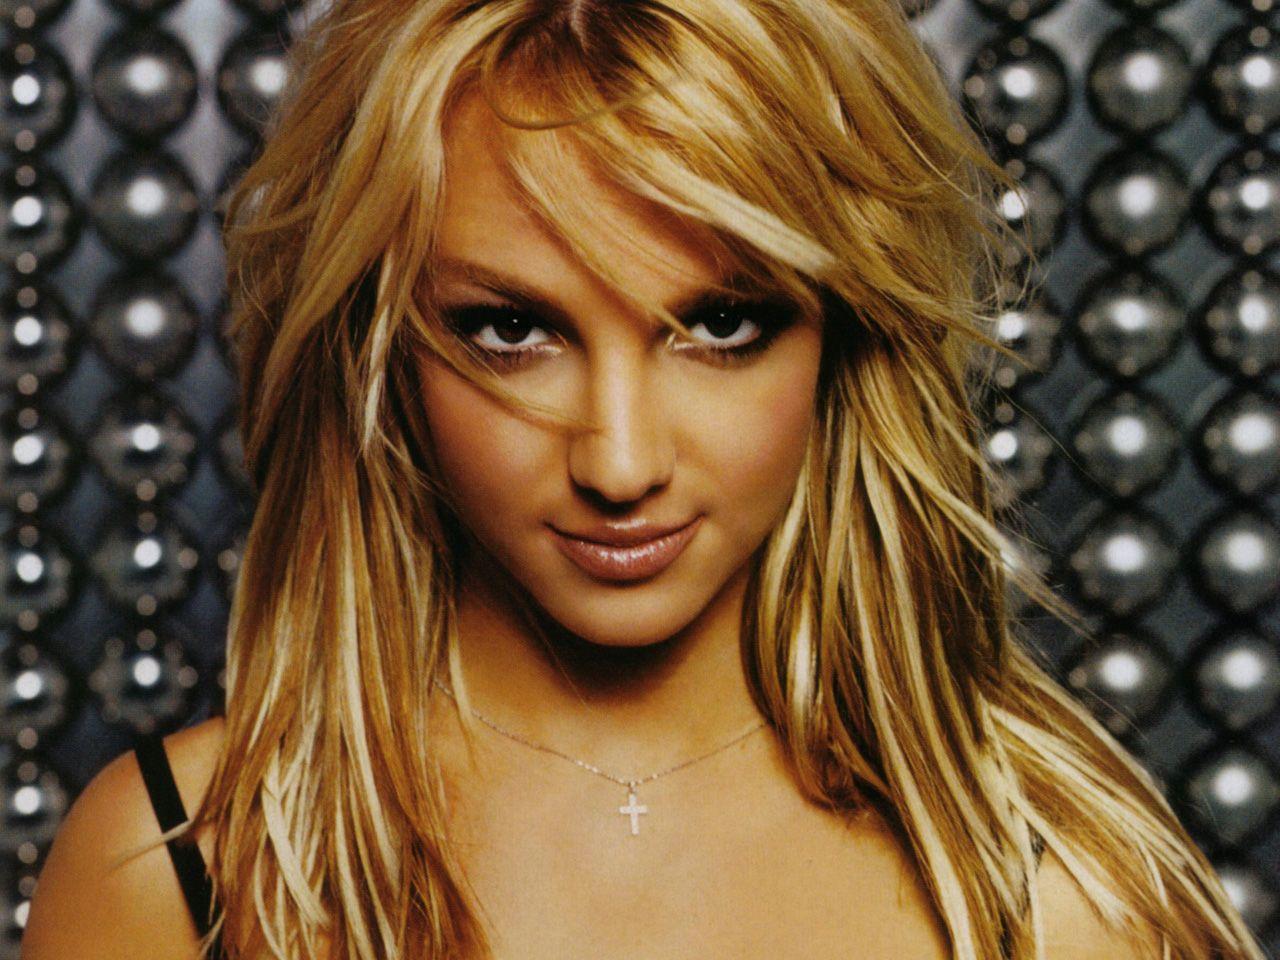 http://4.bp.blogspot.com/-pEGdGslW6q0/To1MLAwY8gI/AAAAAAAAC2o/g9OZfAuiIdE/s1600/Britney++spears+01+%252841%2529.jpg